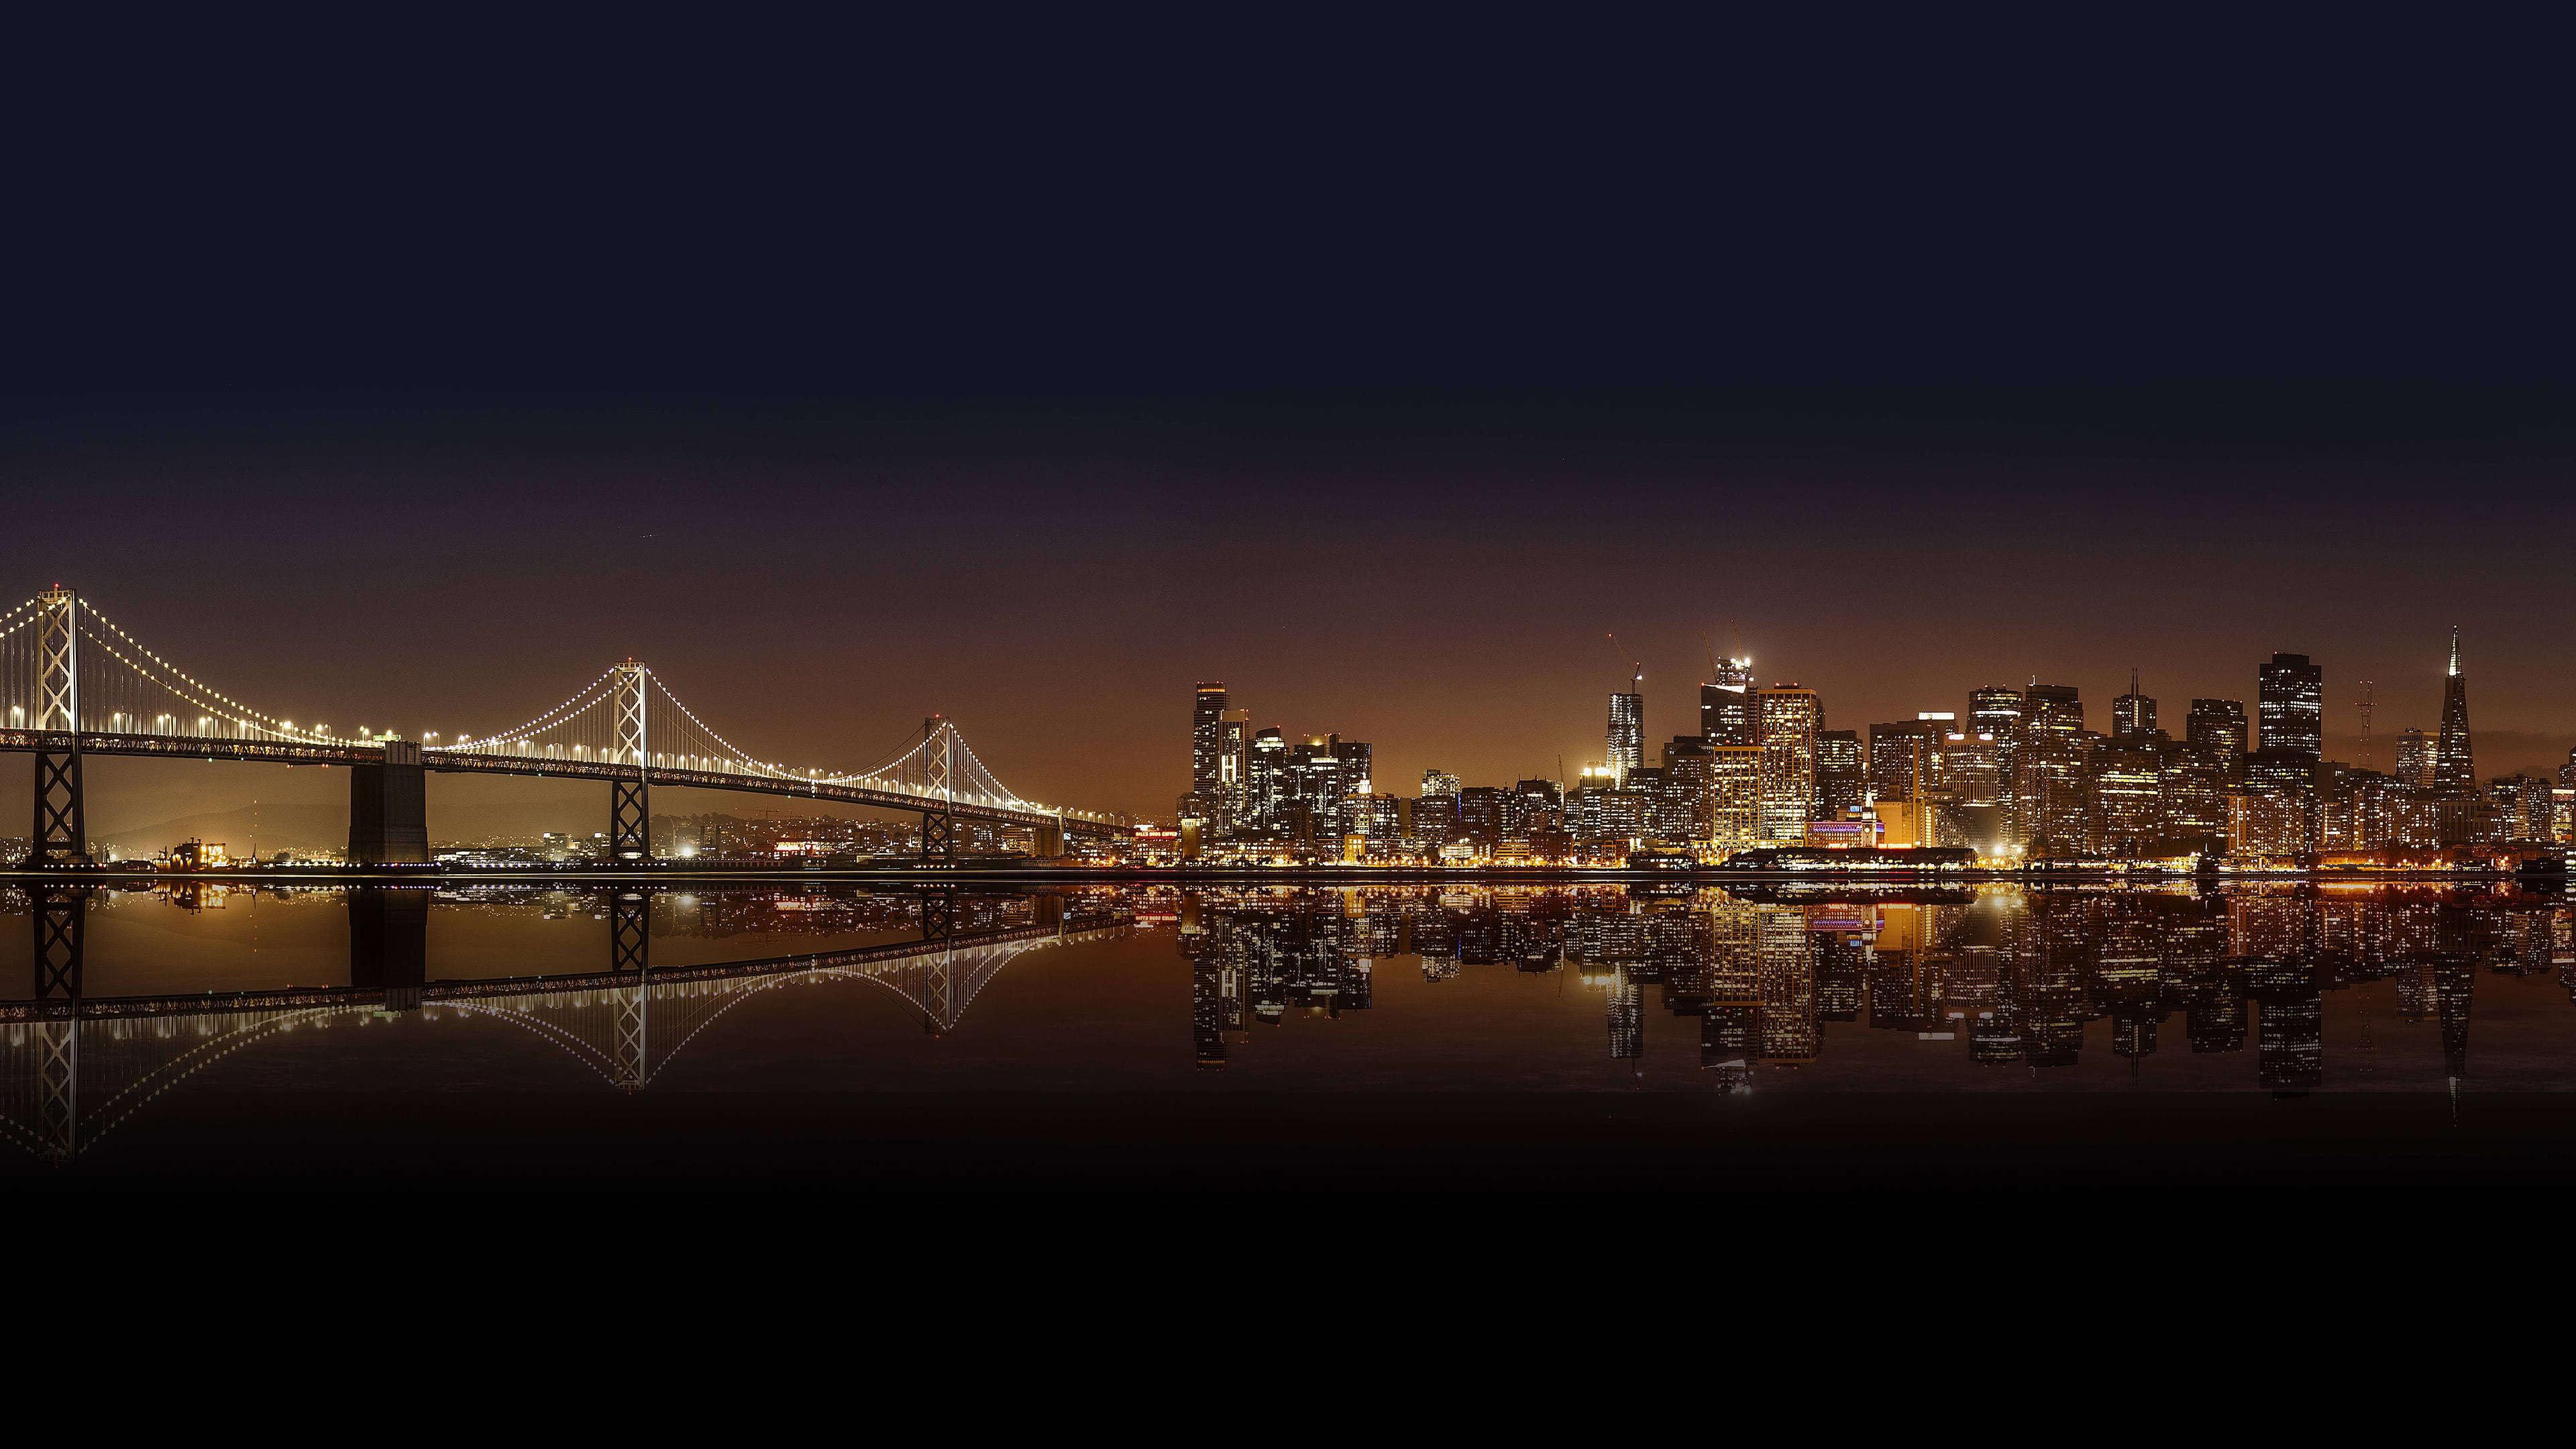 Night Time Cityscape UHD 4K Wallpaper   Pixelz